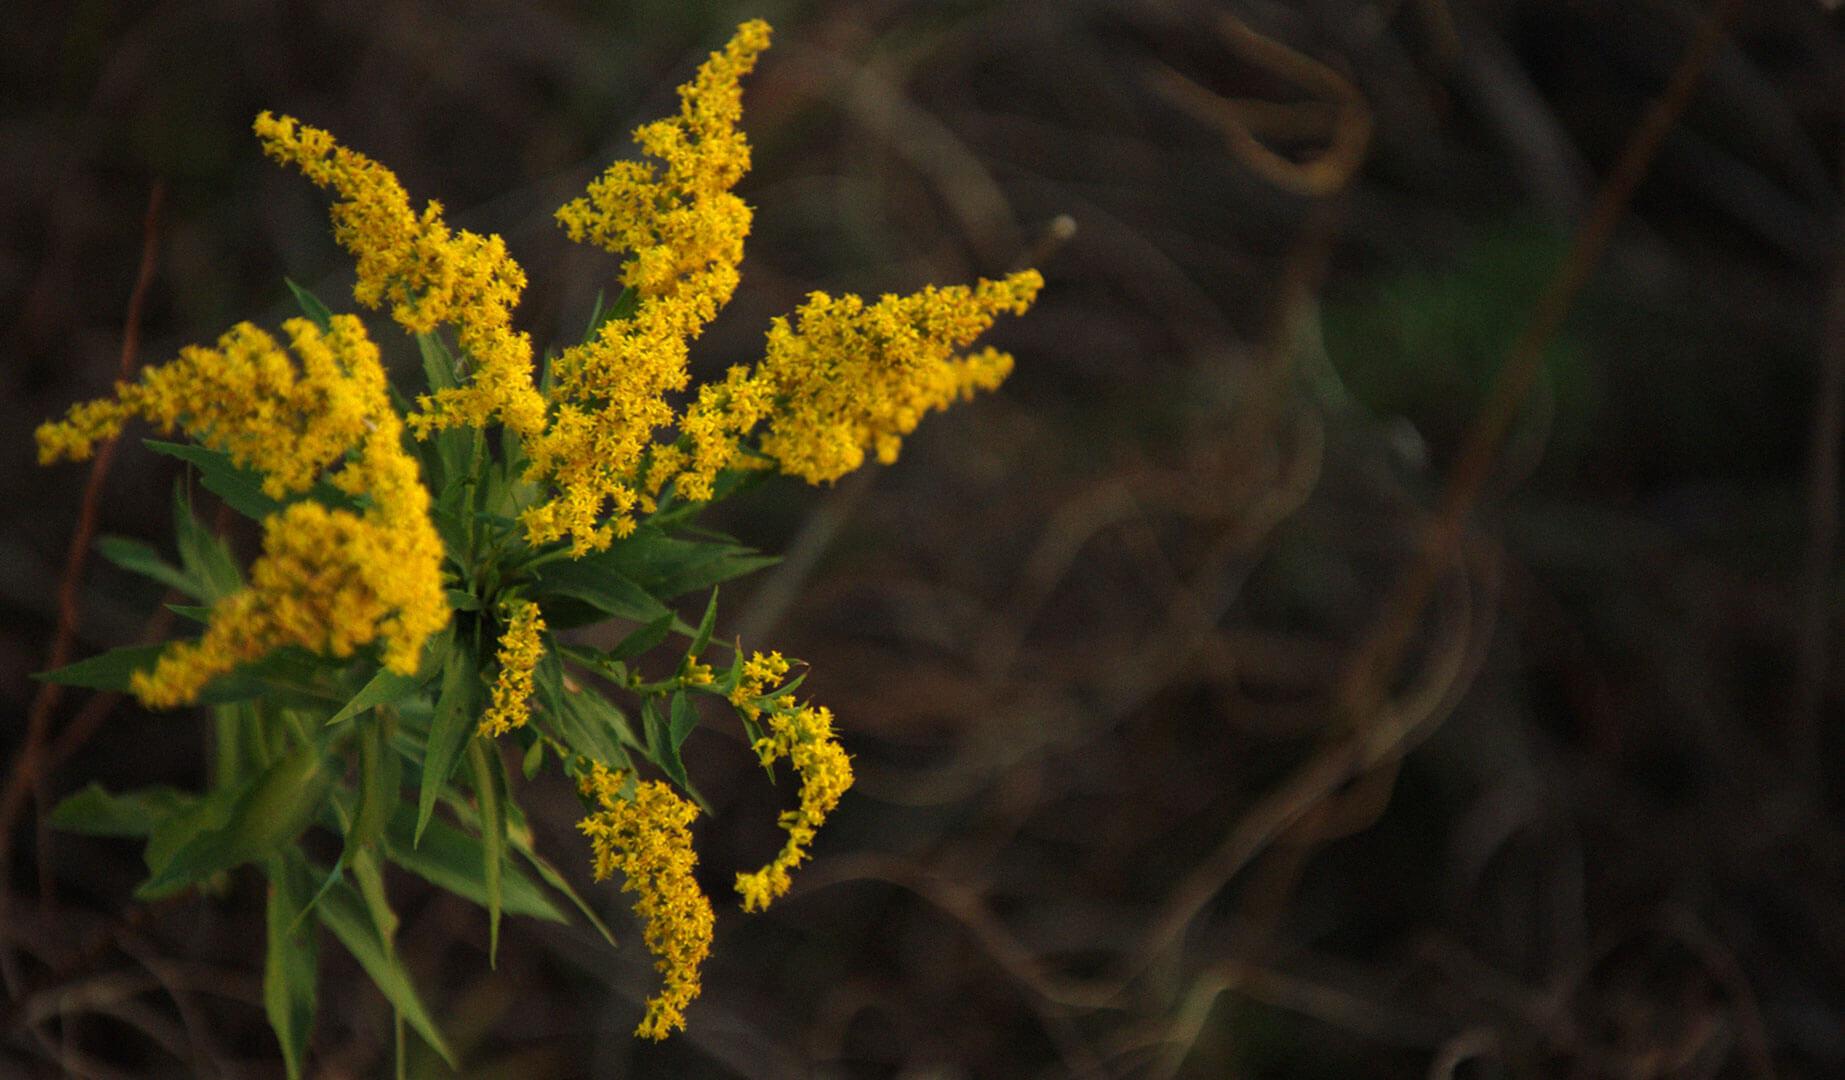 Goldendrod plant